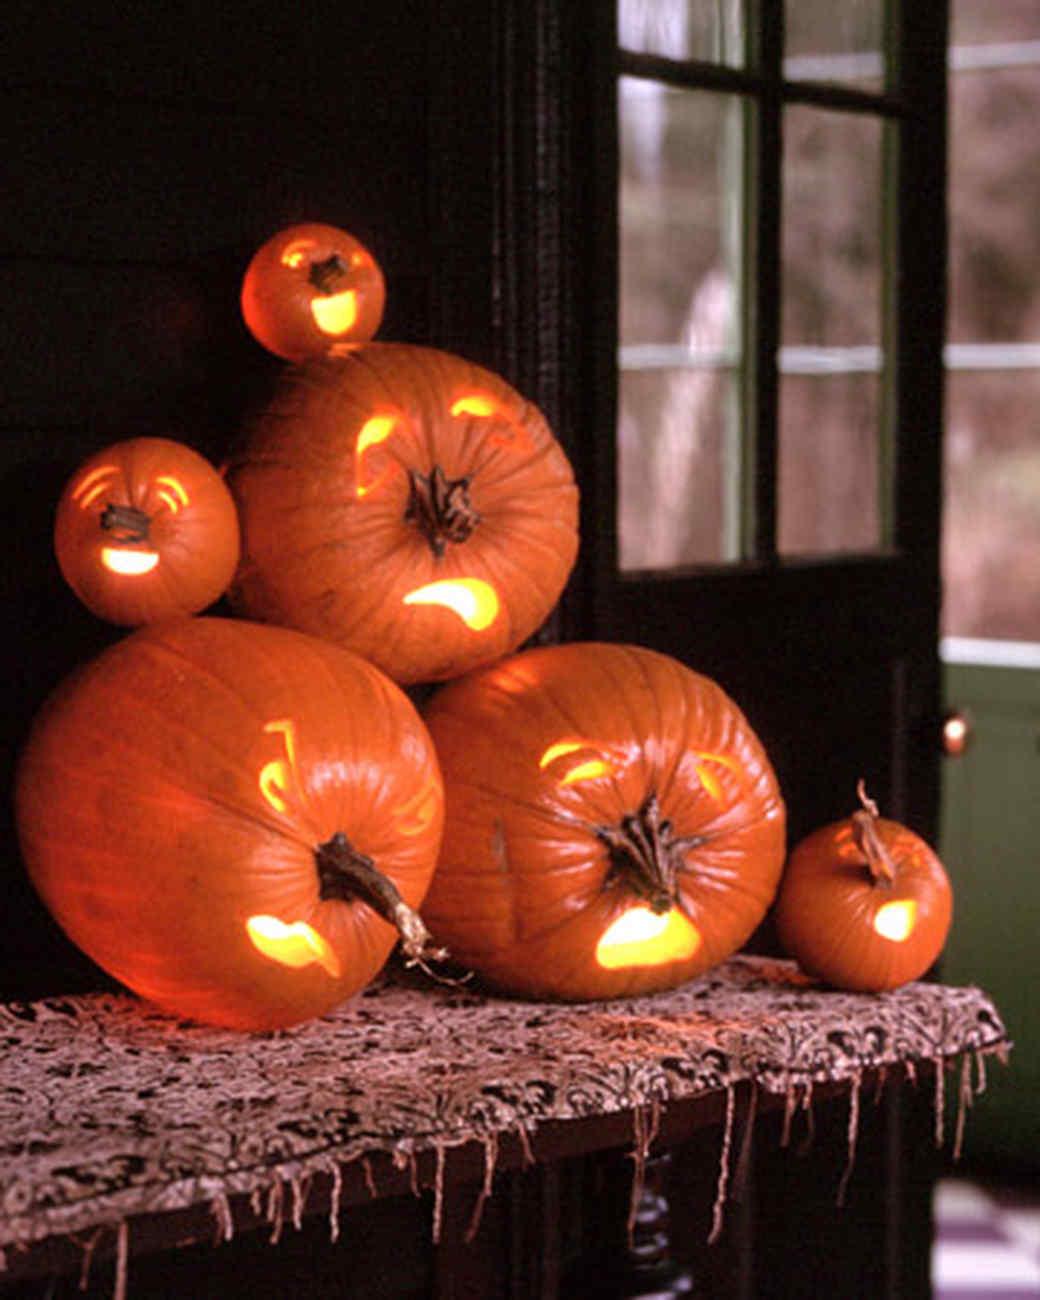 pumpkin carving and decorating ideas | martha stewart